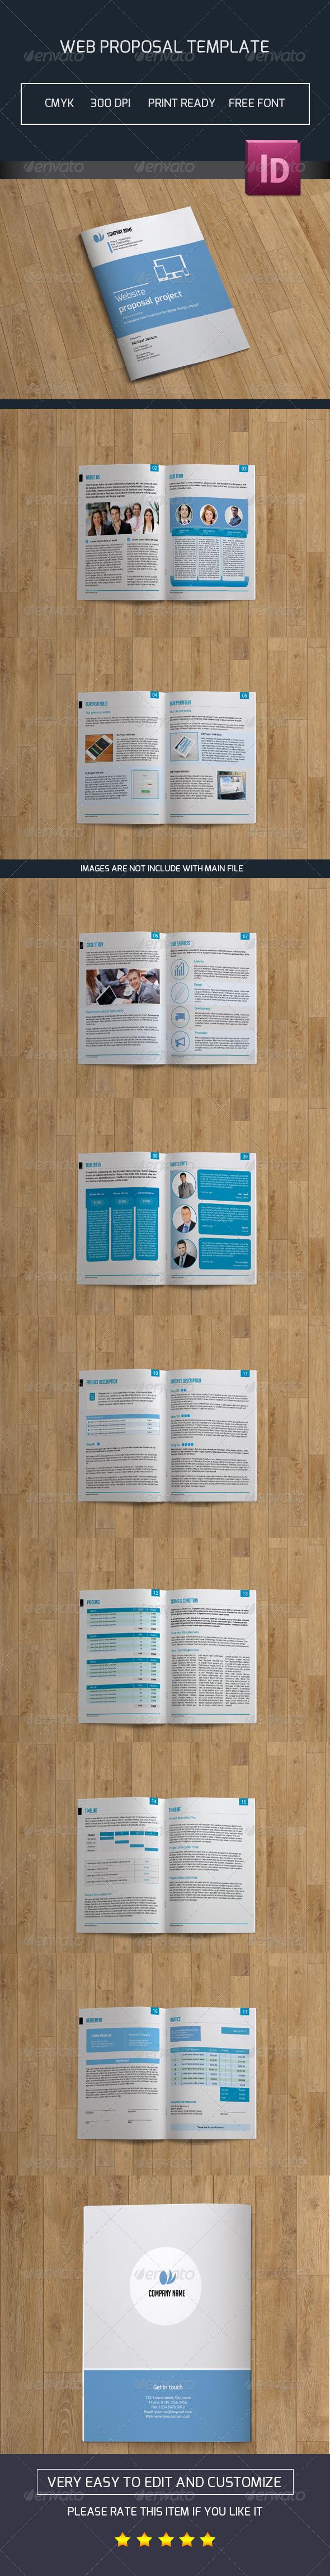 GraphicRiver Web Proposal Brochure-V68 8090536